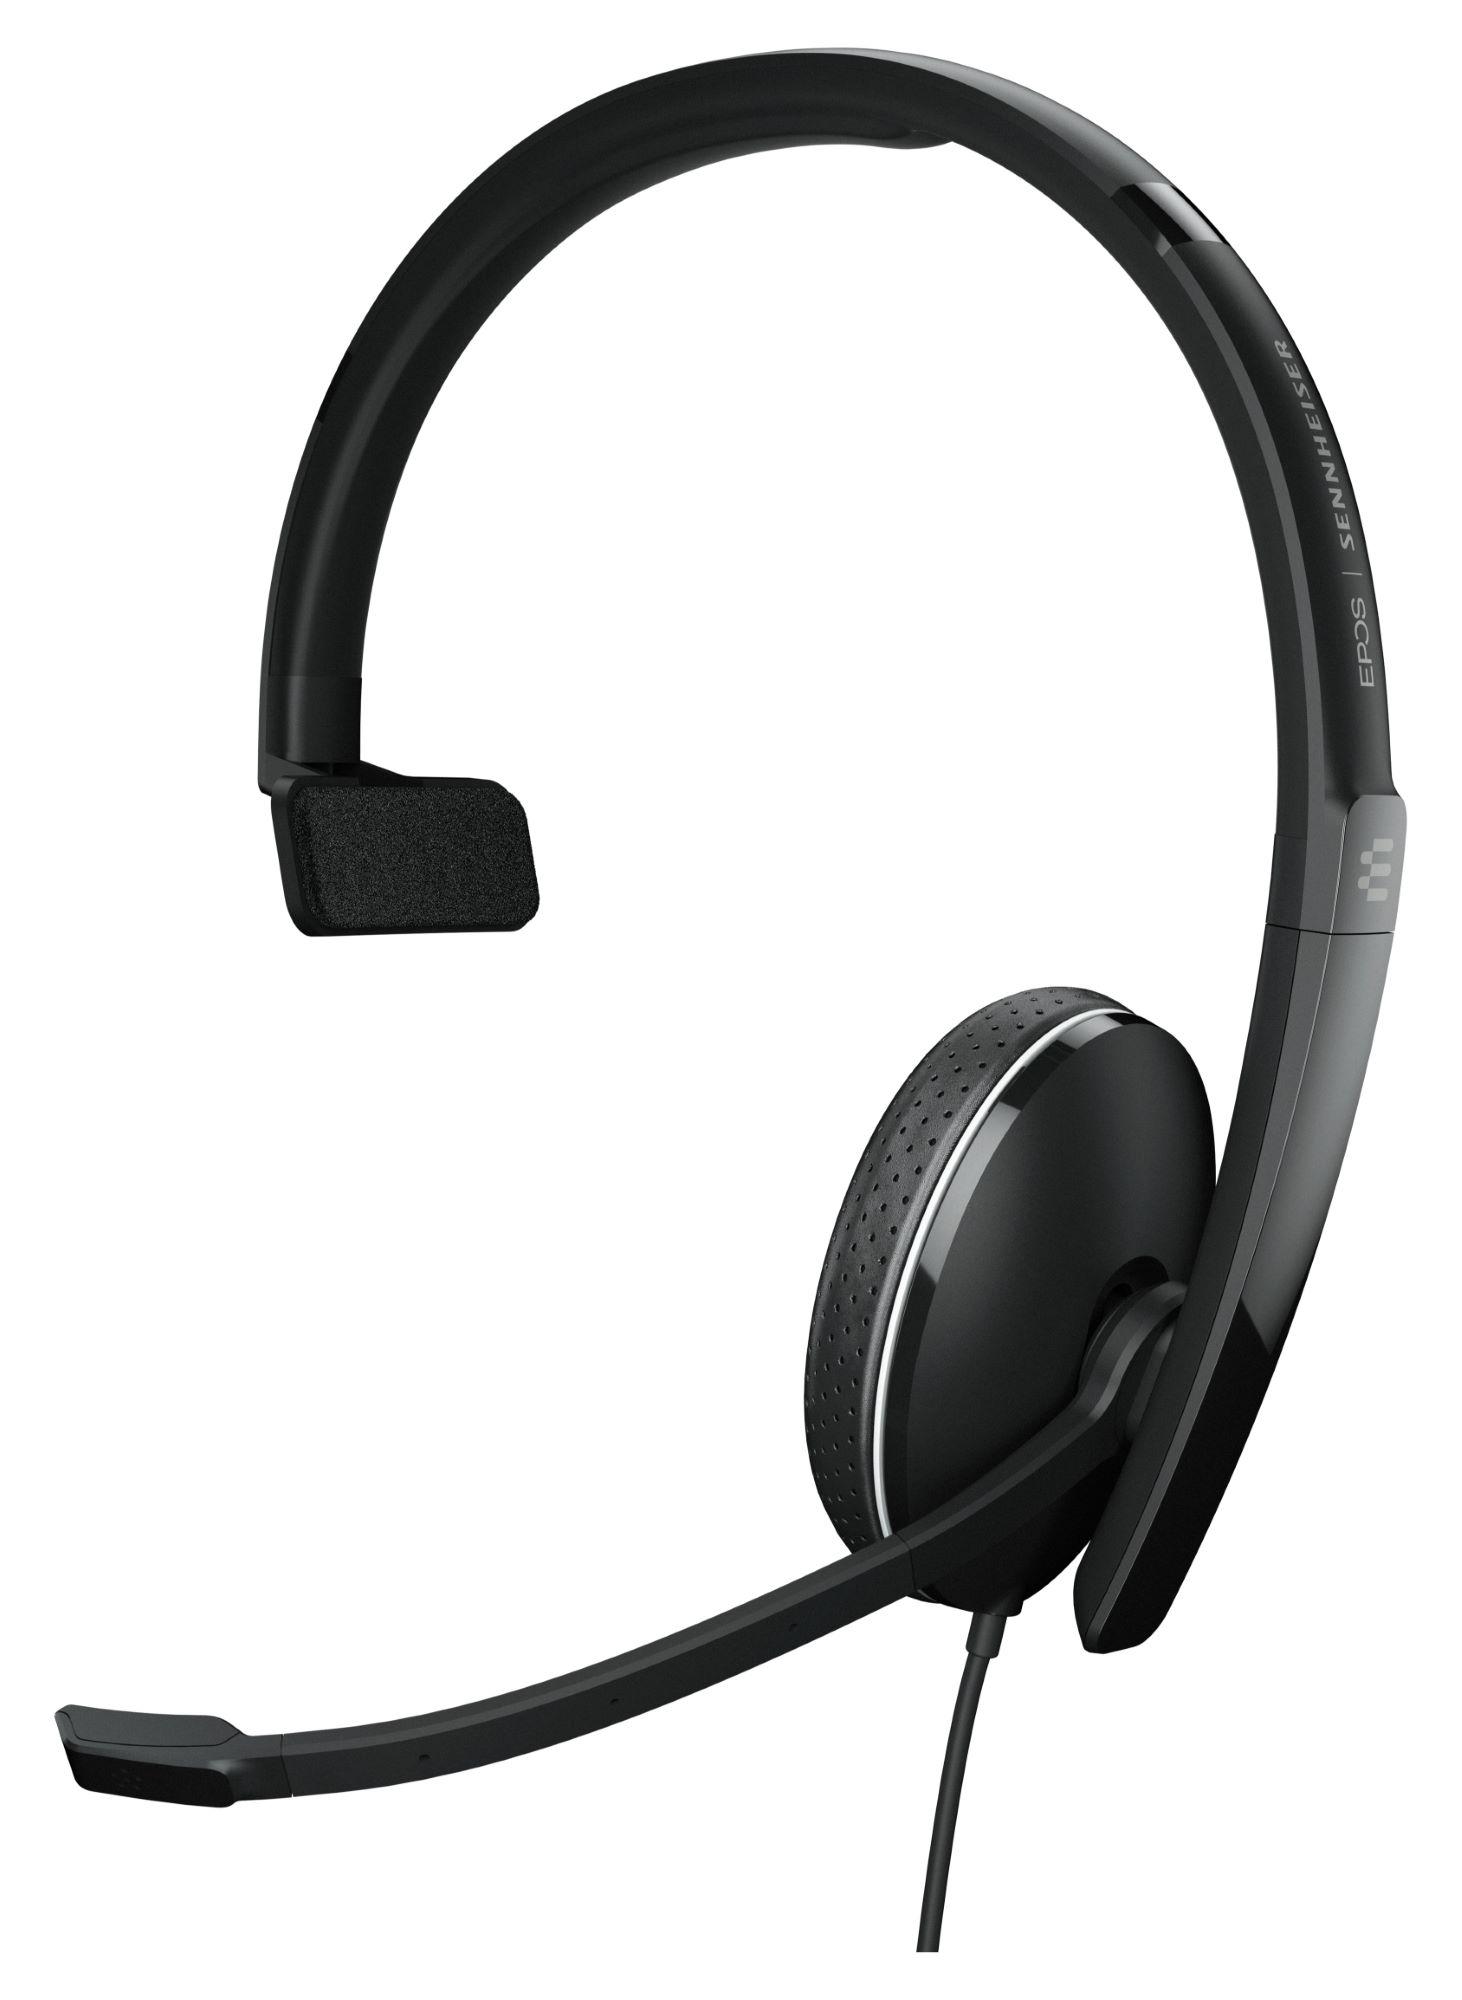 Kopfhoerer - EPOS ADAPT 135 USB II Headset - Onlineshop Musikhaus Kirstein